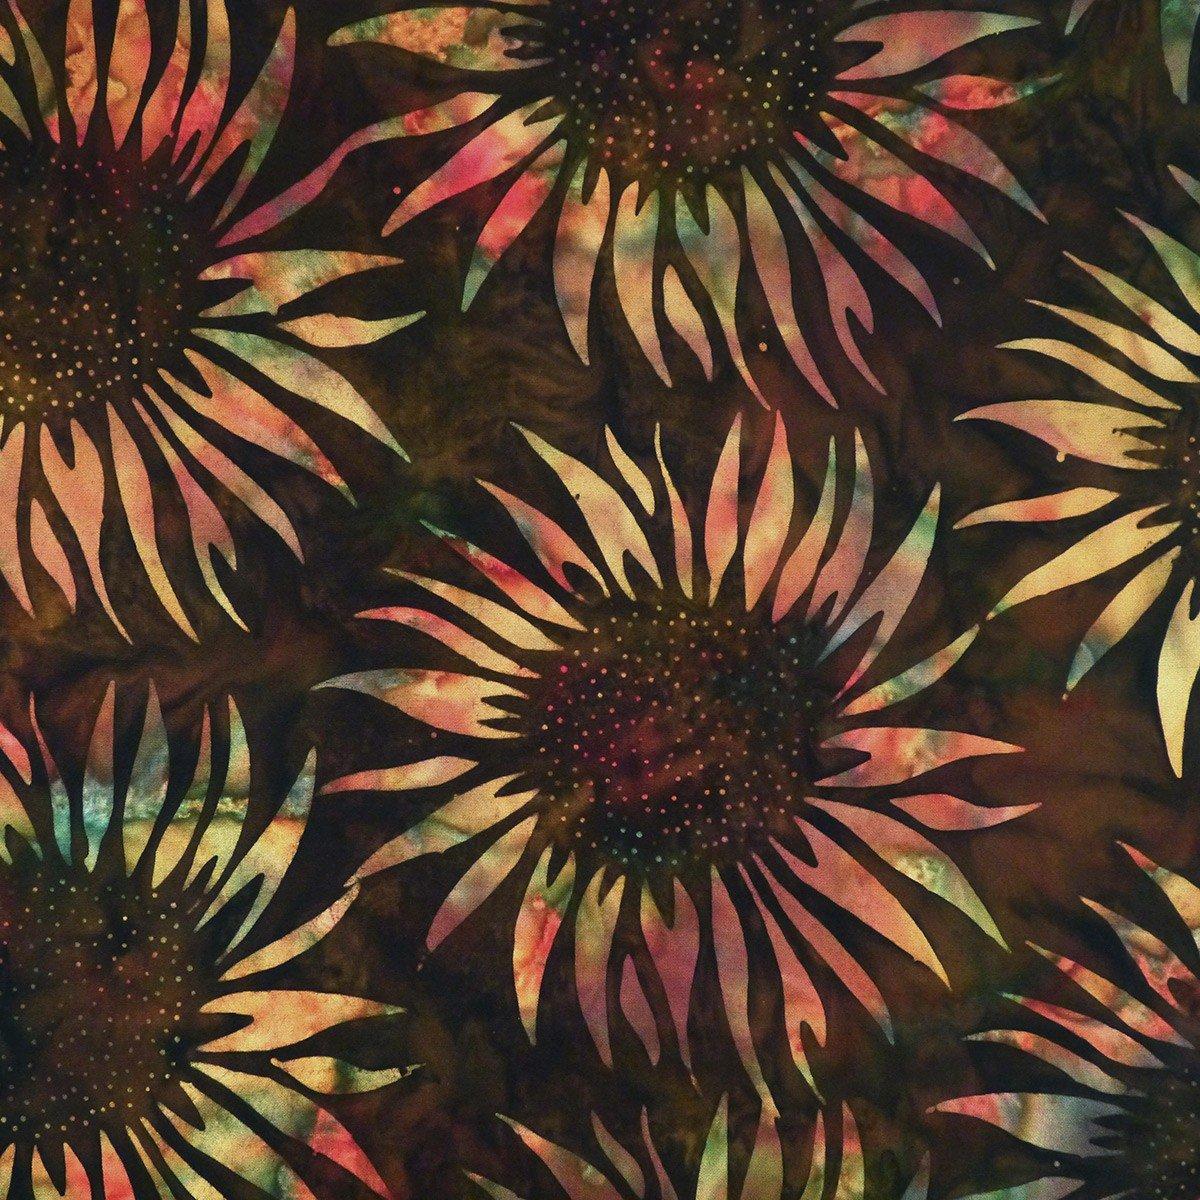 Cornucopia - Sunflower, Jambalaya - by Batik by Mirah